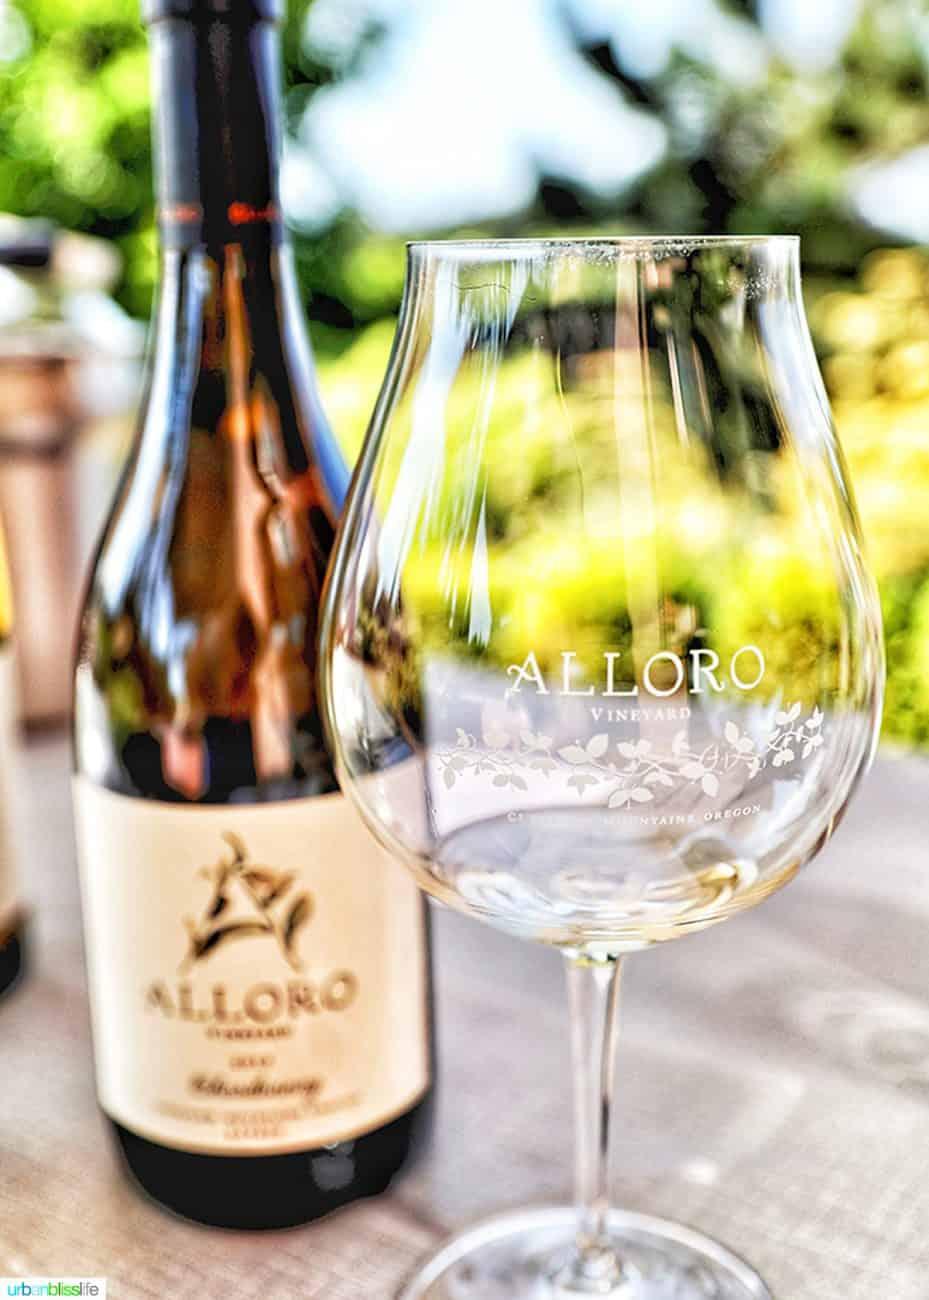 Alloro Vineyards Riesling